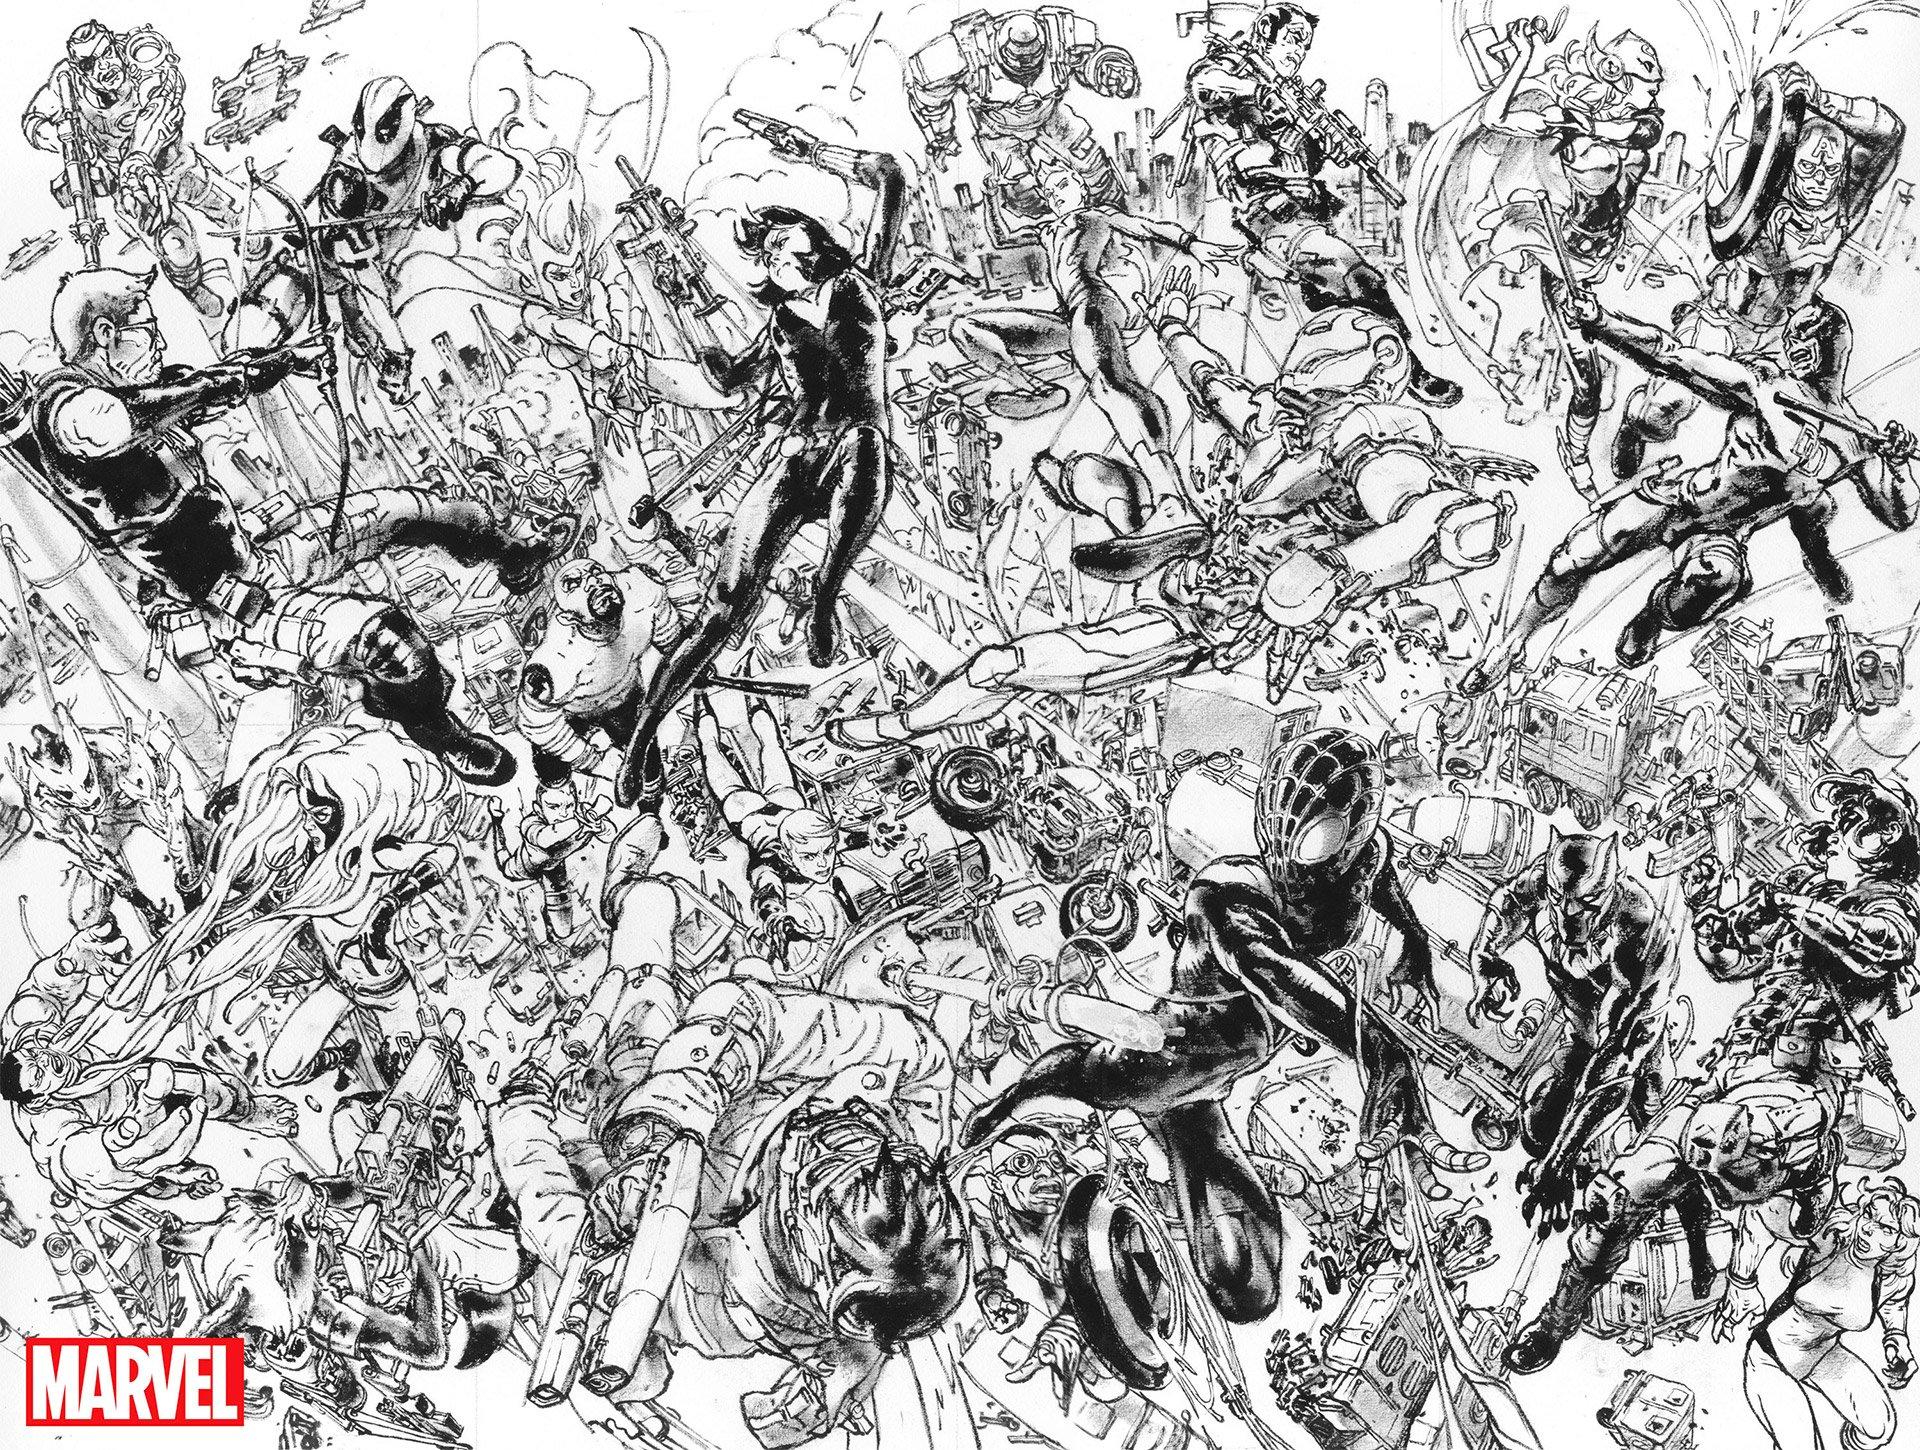 Marvel Civil War II Variant Covers